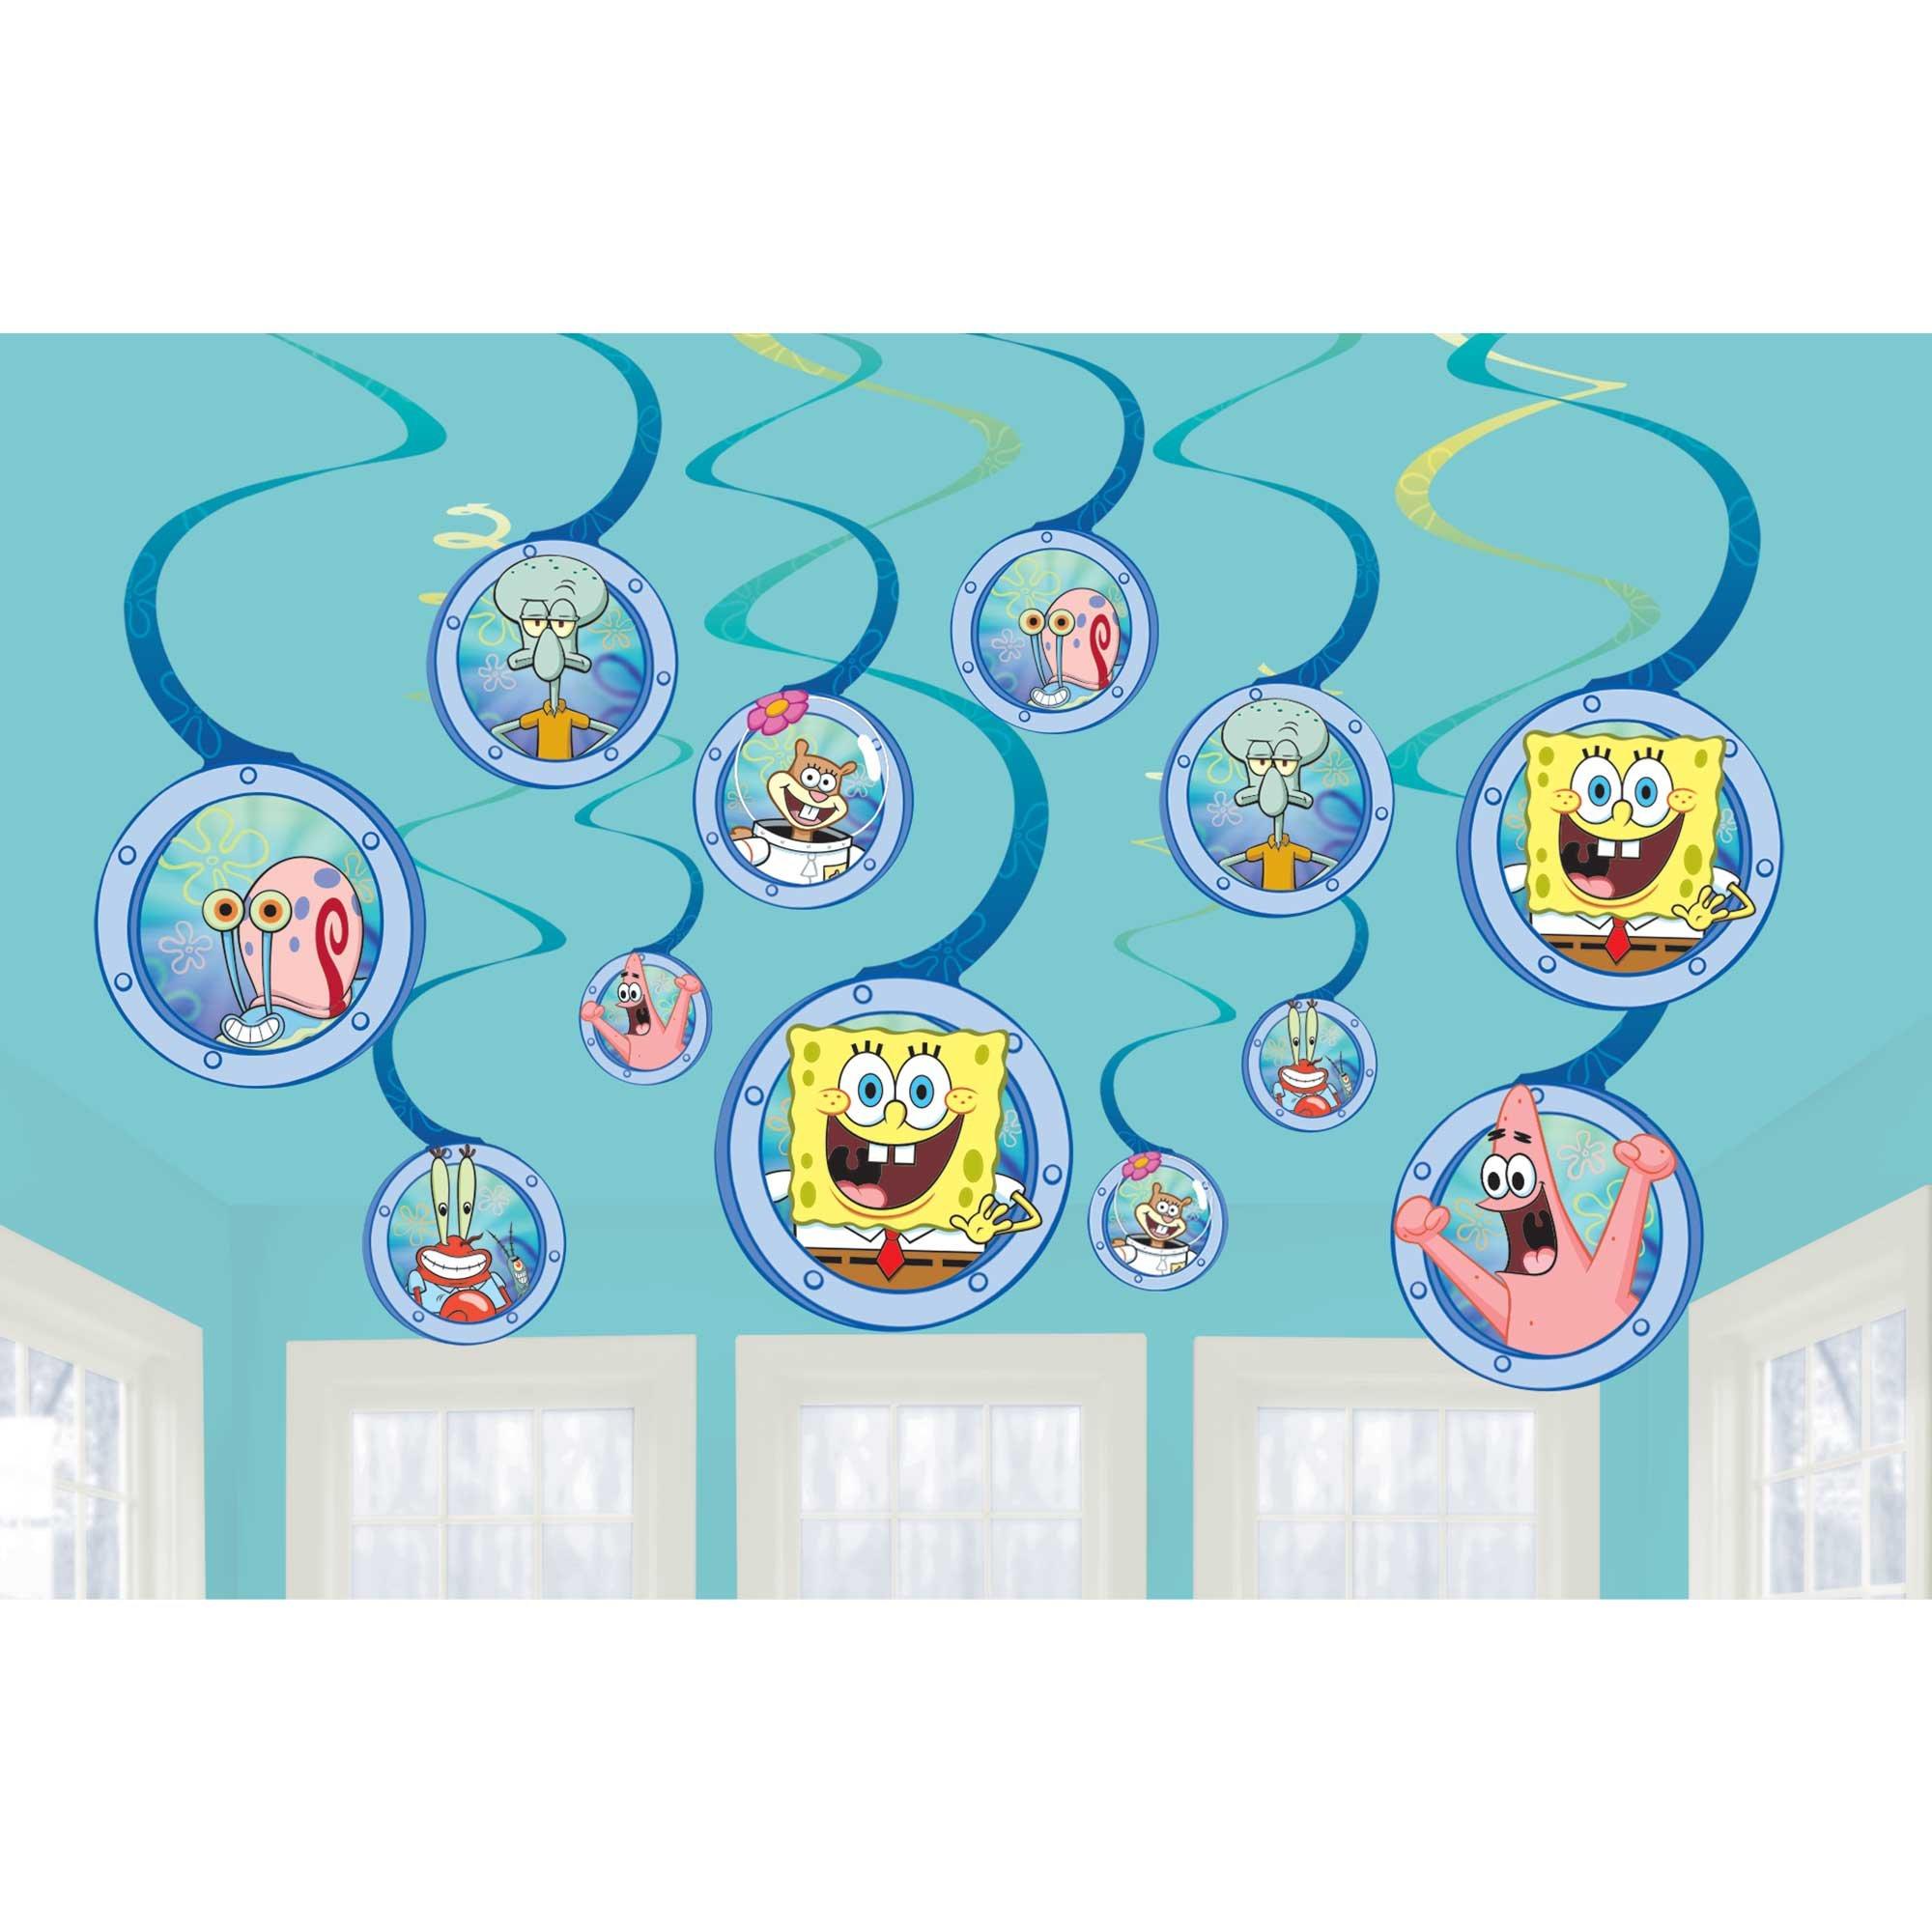 SpongeBob Spiral Swirls Hanging Decorations